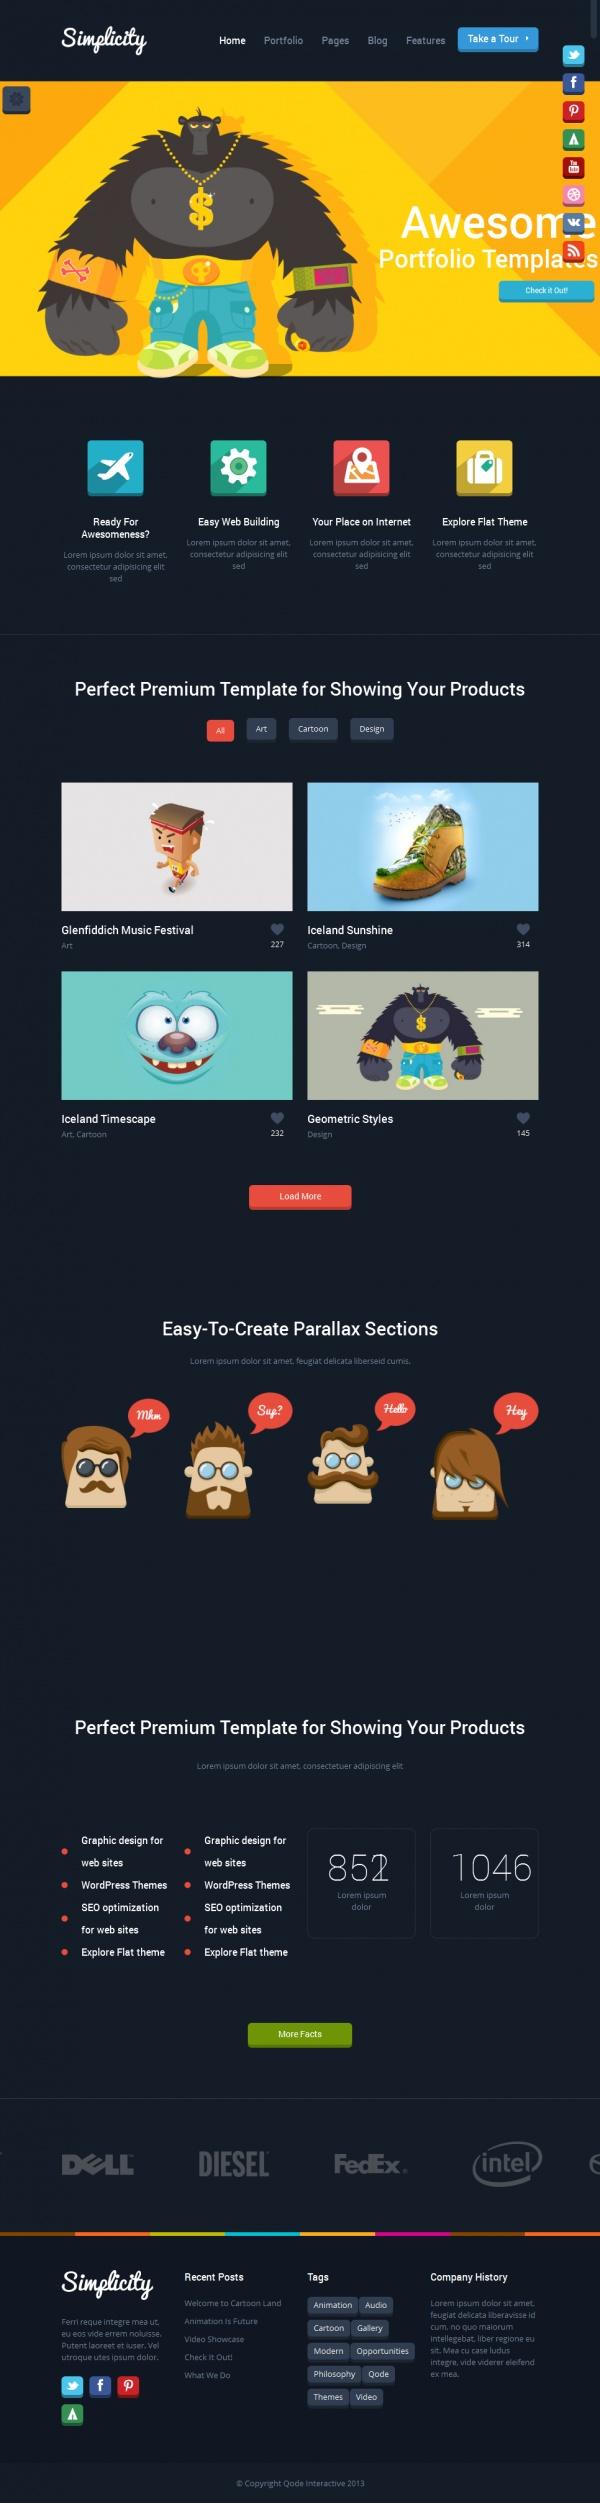 Simplicity Best Creative WordPress Themes June